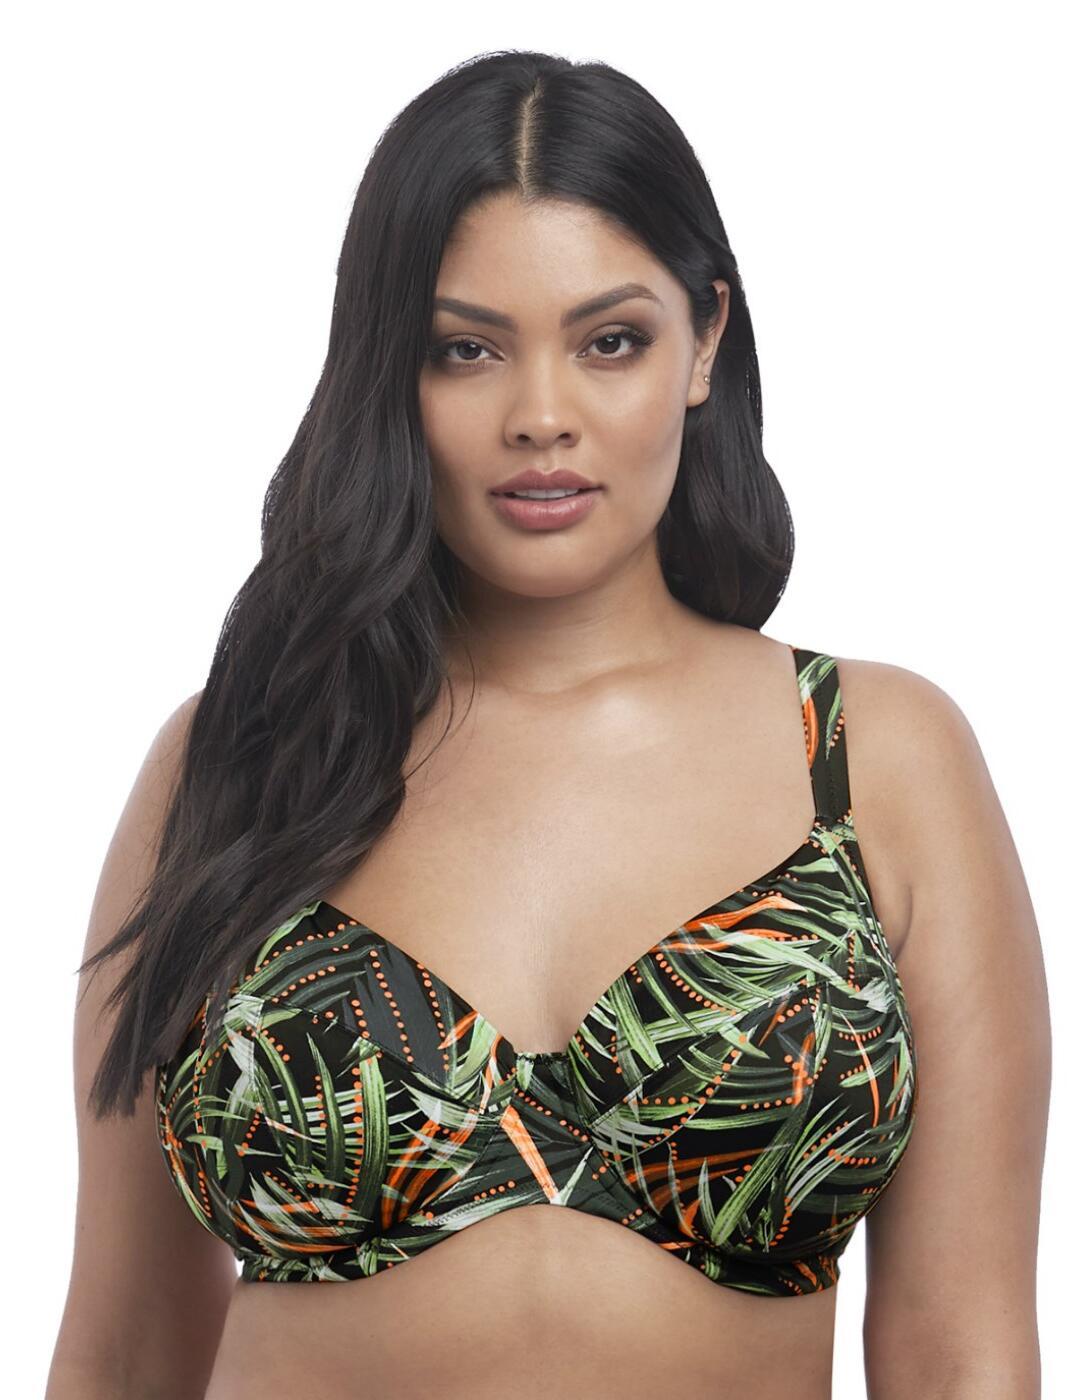 7162 Elomi Amazonia Underwired Plunge Bikini Top - 7162 Khaki Print